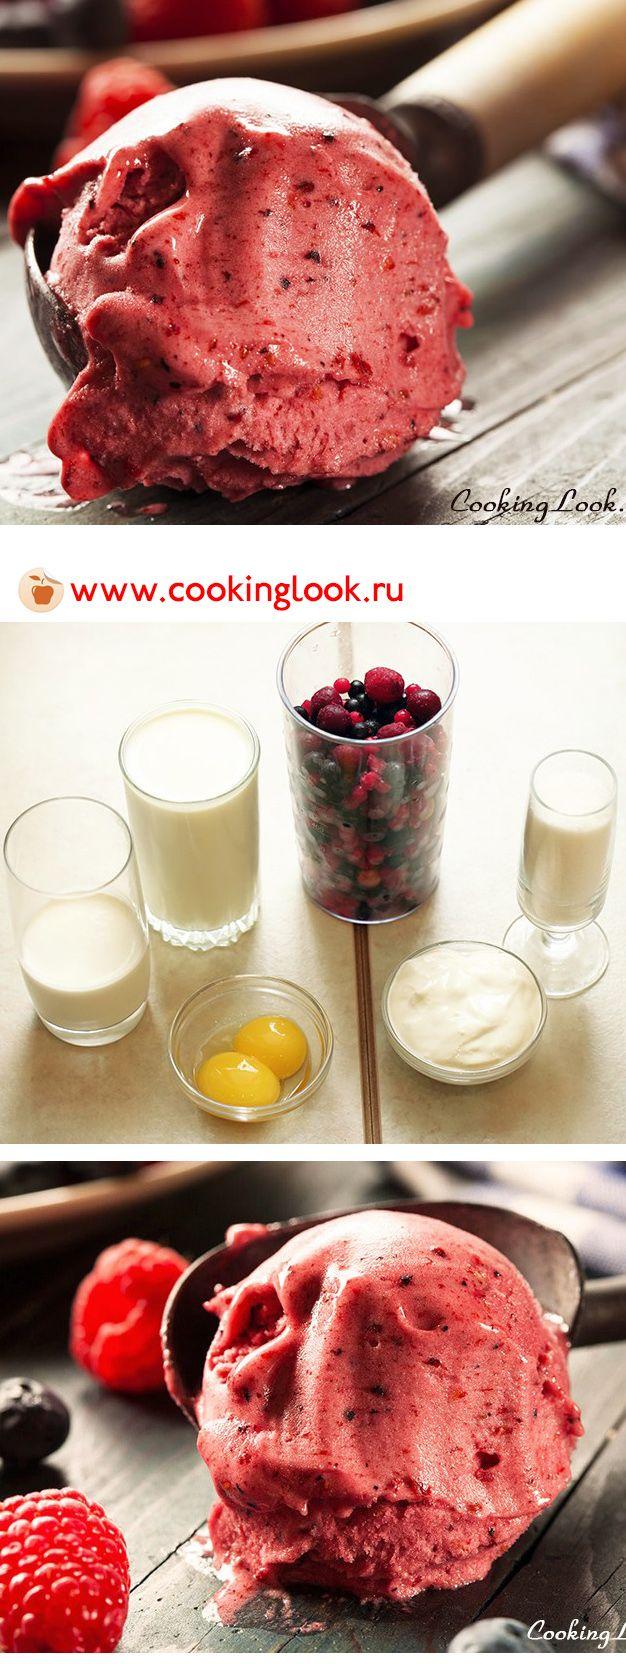 Простой рецепт морожена в домашних условиях, рецепт морожена, рецепт домашнего морожена, рецепт морожена в домашних условиях, морожено рецепт,  рецепт приготовления мороженного, рецепт домашнего фруктовое морожена,  домашнее мороженное рецепт, рецепт мороженого, домашнее мороженое рецепт, рецепт мороженого условиях, мороженое в домашних условиях рецепт, A simple recipe is frozen at home, a frozen recipe, a homemade ice cream recipe, an ice cream recipe at home, an ice cream recipe,